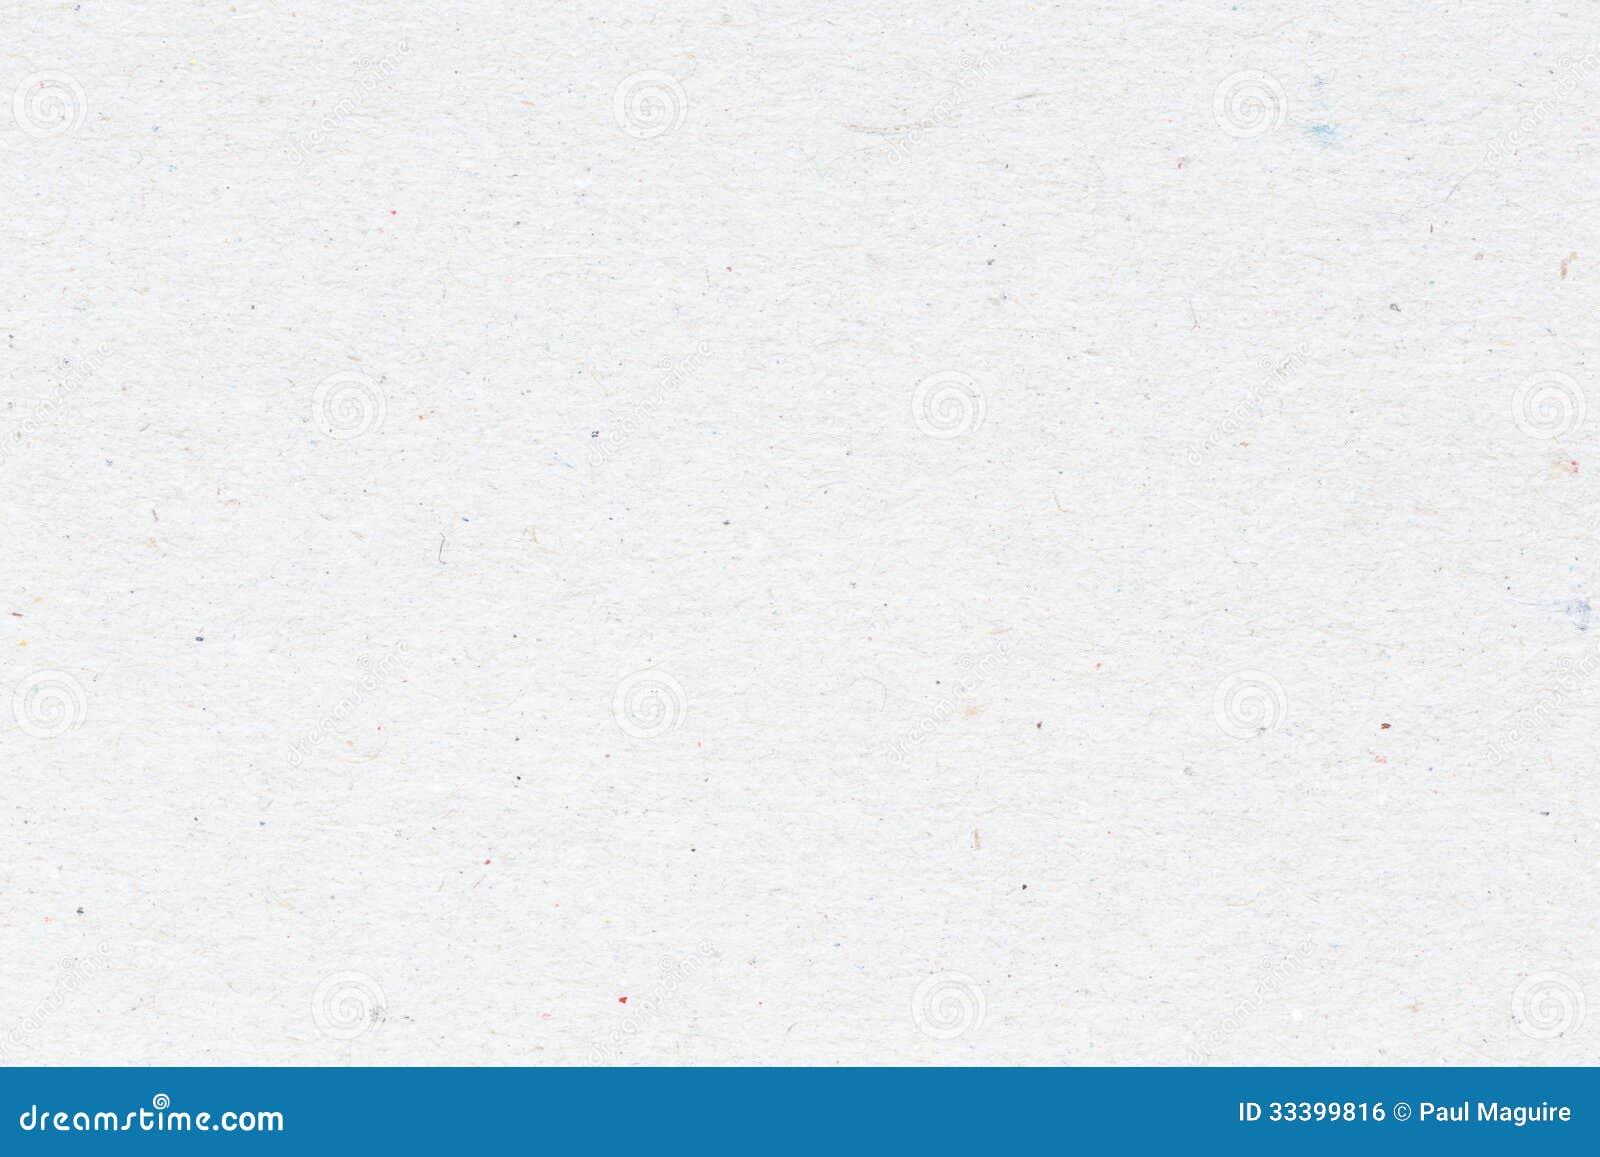 White Cardboard Background Royalty Free Stock Image ...